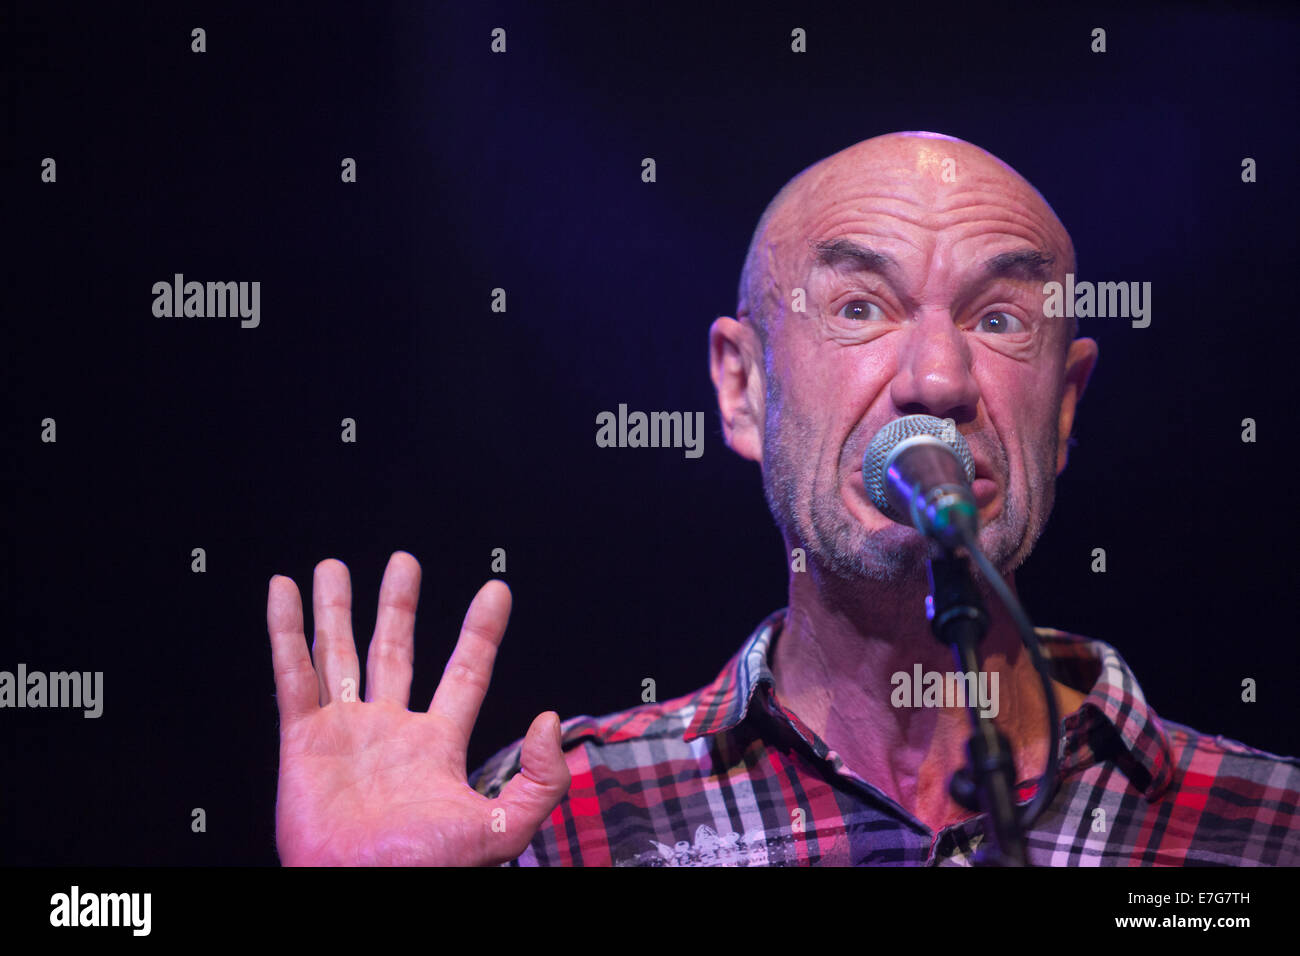 Edinburgh, Scotland, UK. 16th Sep, 2014. Tam Dean Burn reads from The Gruffalo during rehearsals for Blabbermouth. - Stock Image